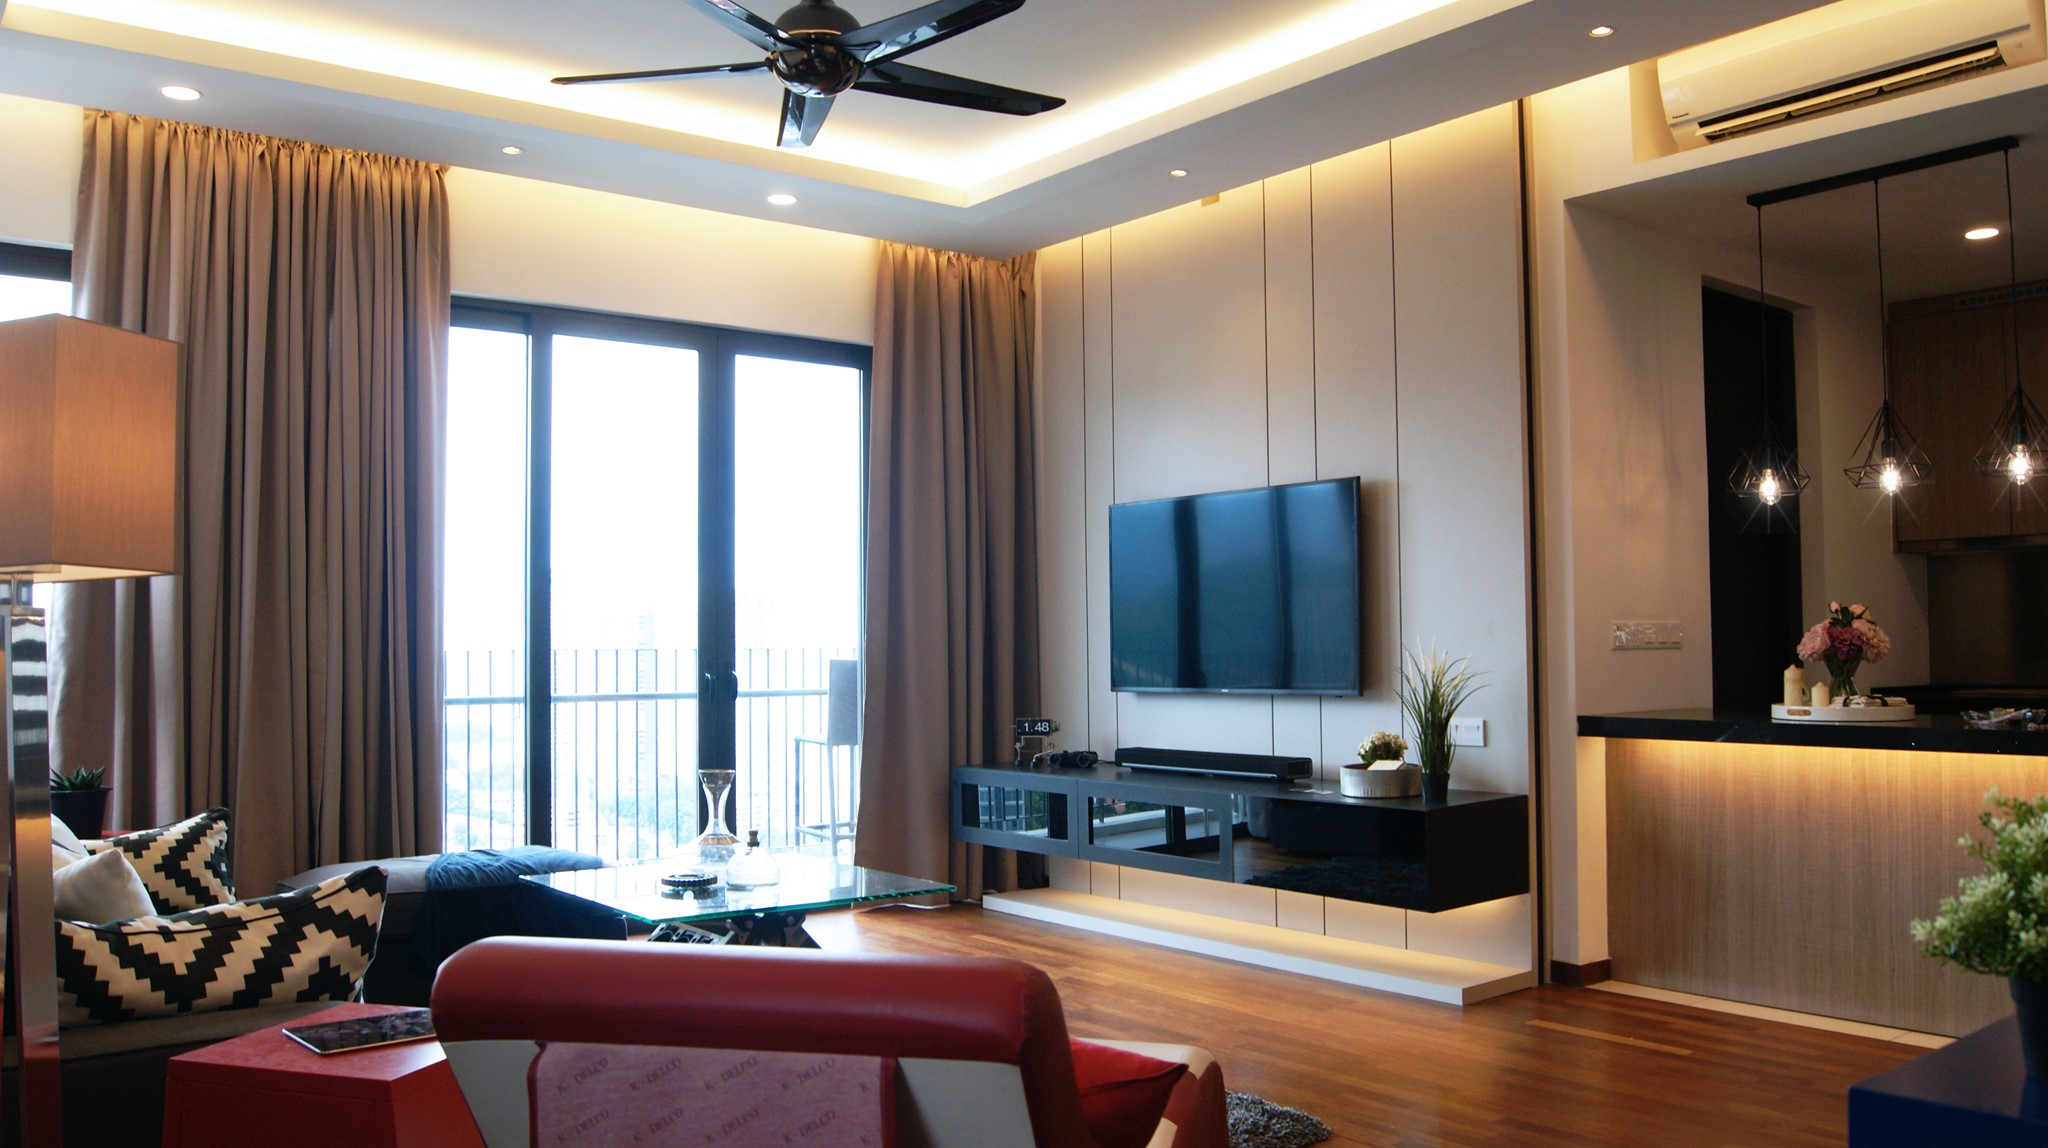 desquared-design-home-services